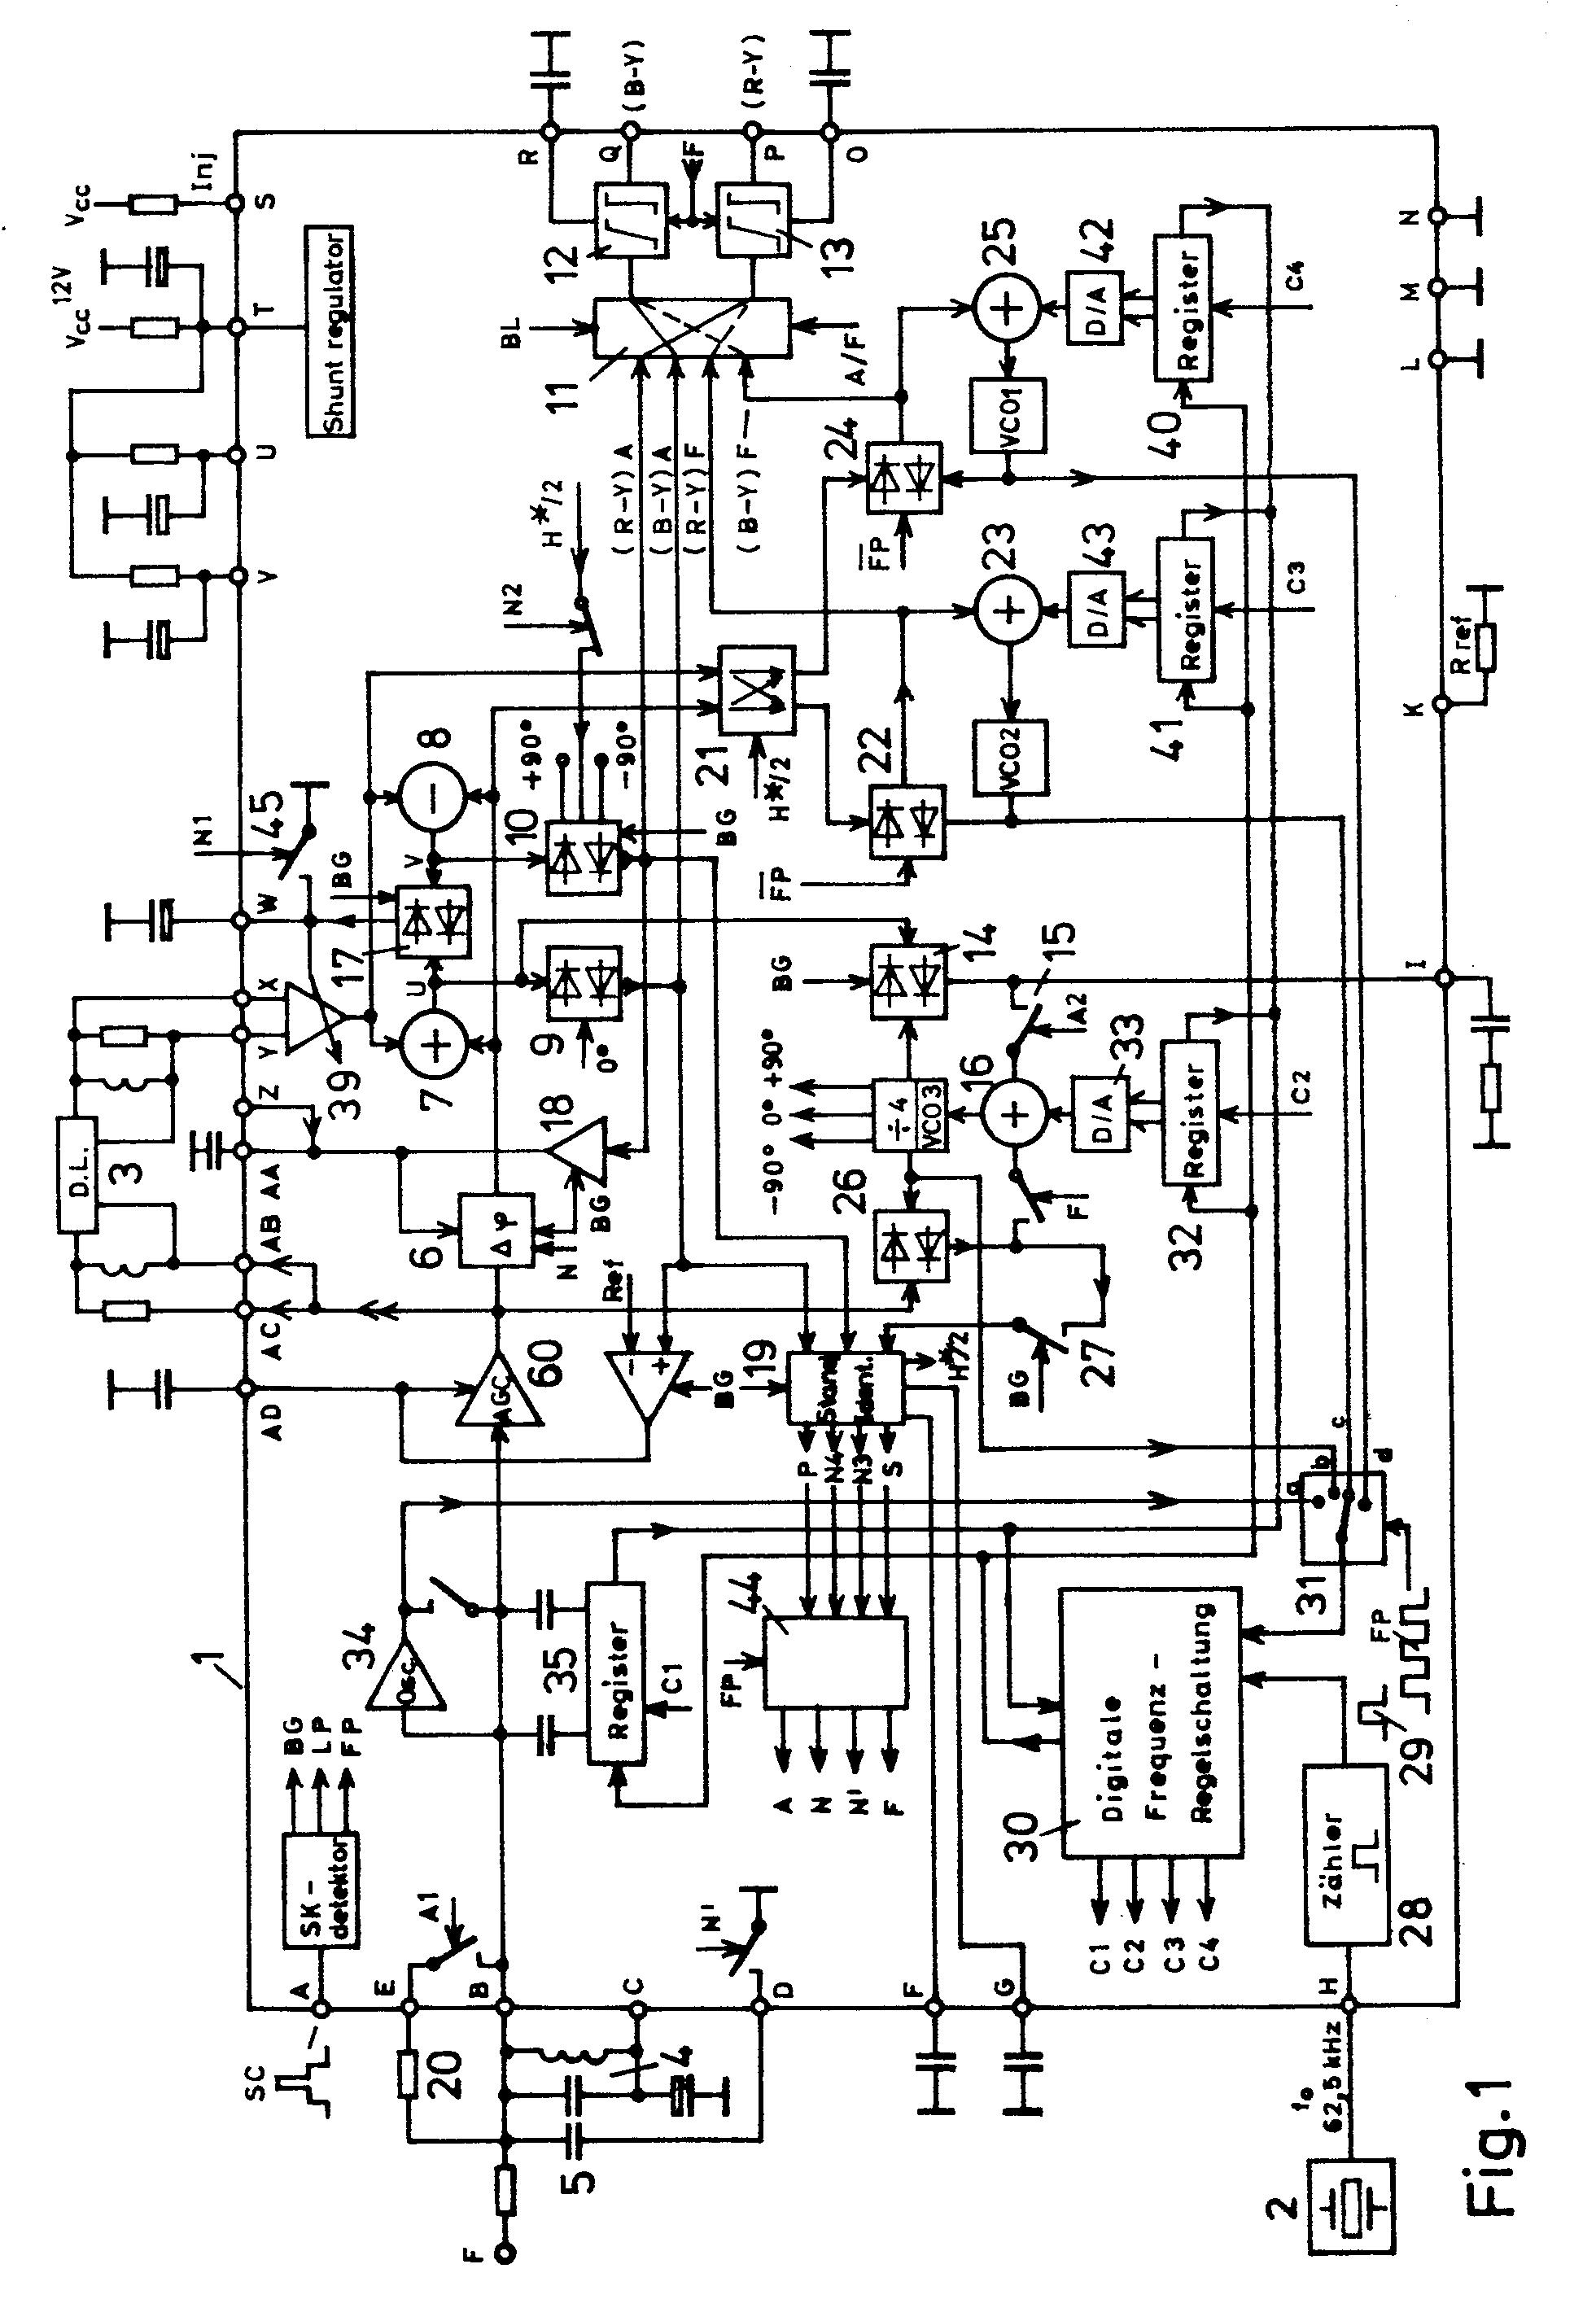 patent ep0143373a2